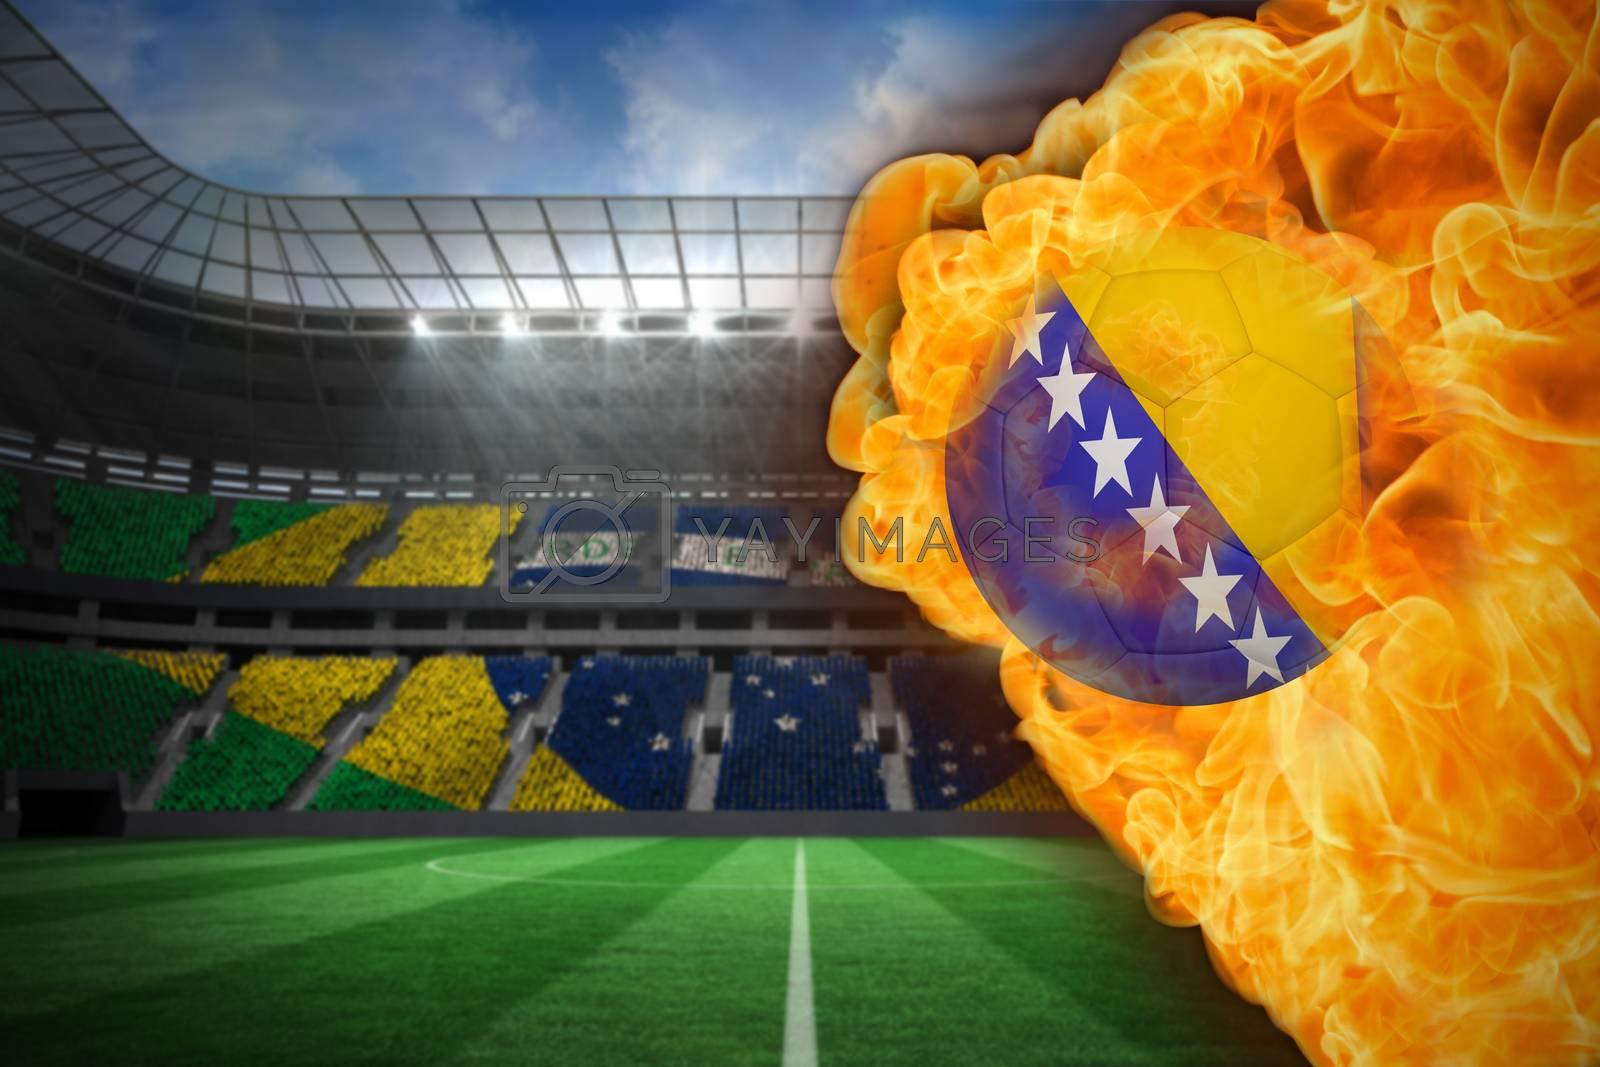 Fire surrounding bosnia flag football by Wavebreakmedia